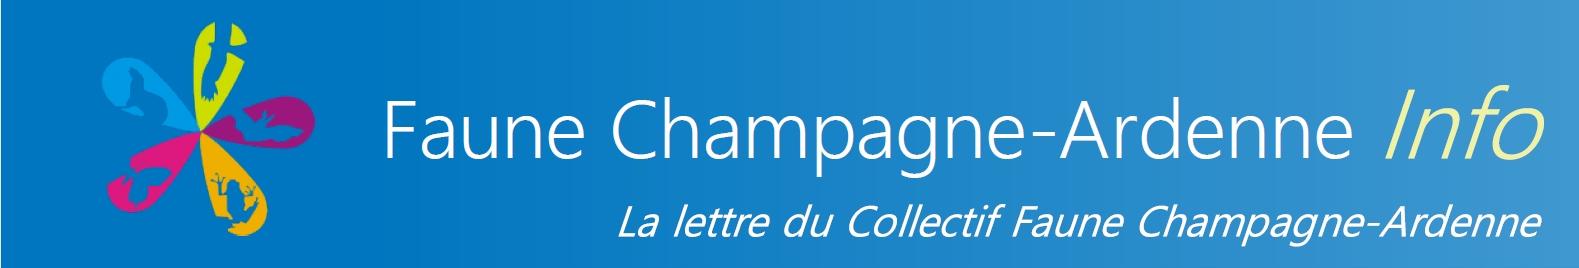 https://cdnfiles1.biolovision.net/www.faune-champagne-ardenne.org/userfiles/LettredinfoFCA/bandeaupresentationFauneChampagne-ArdenneInfo2.jpg